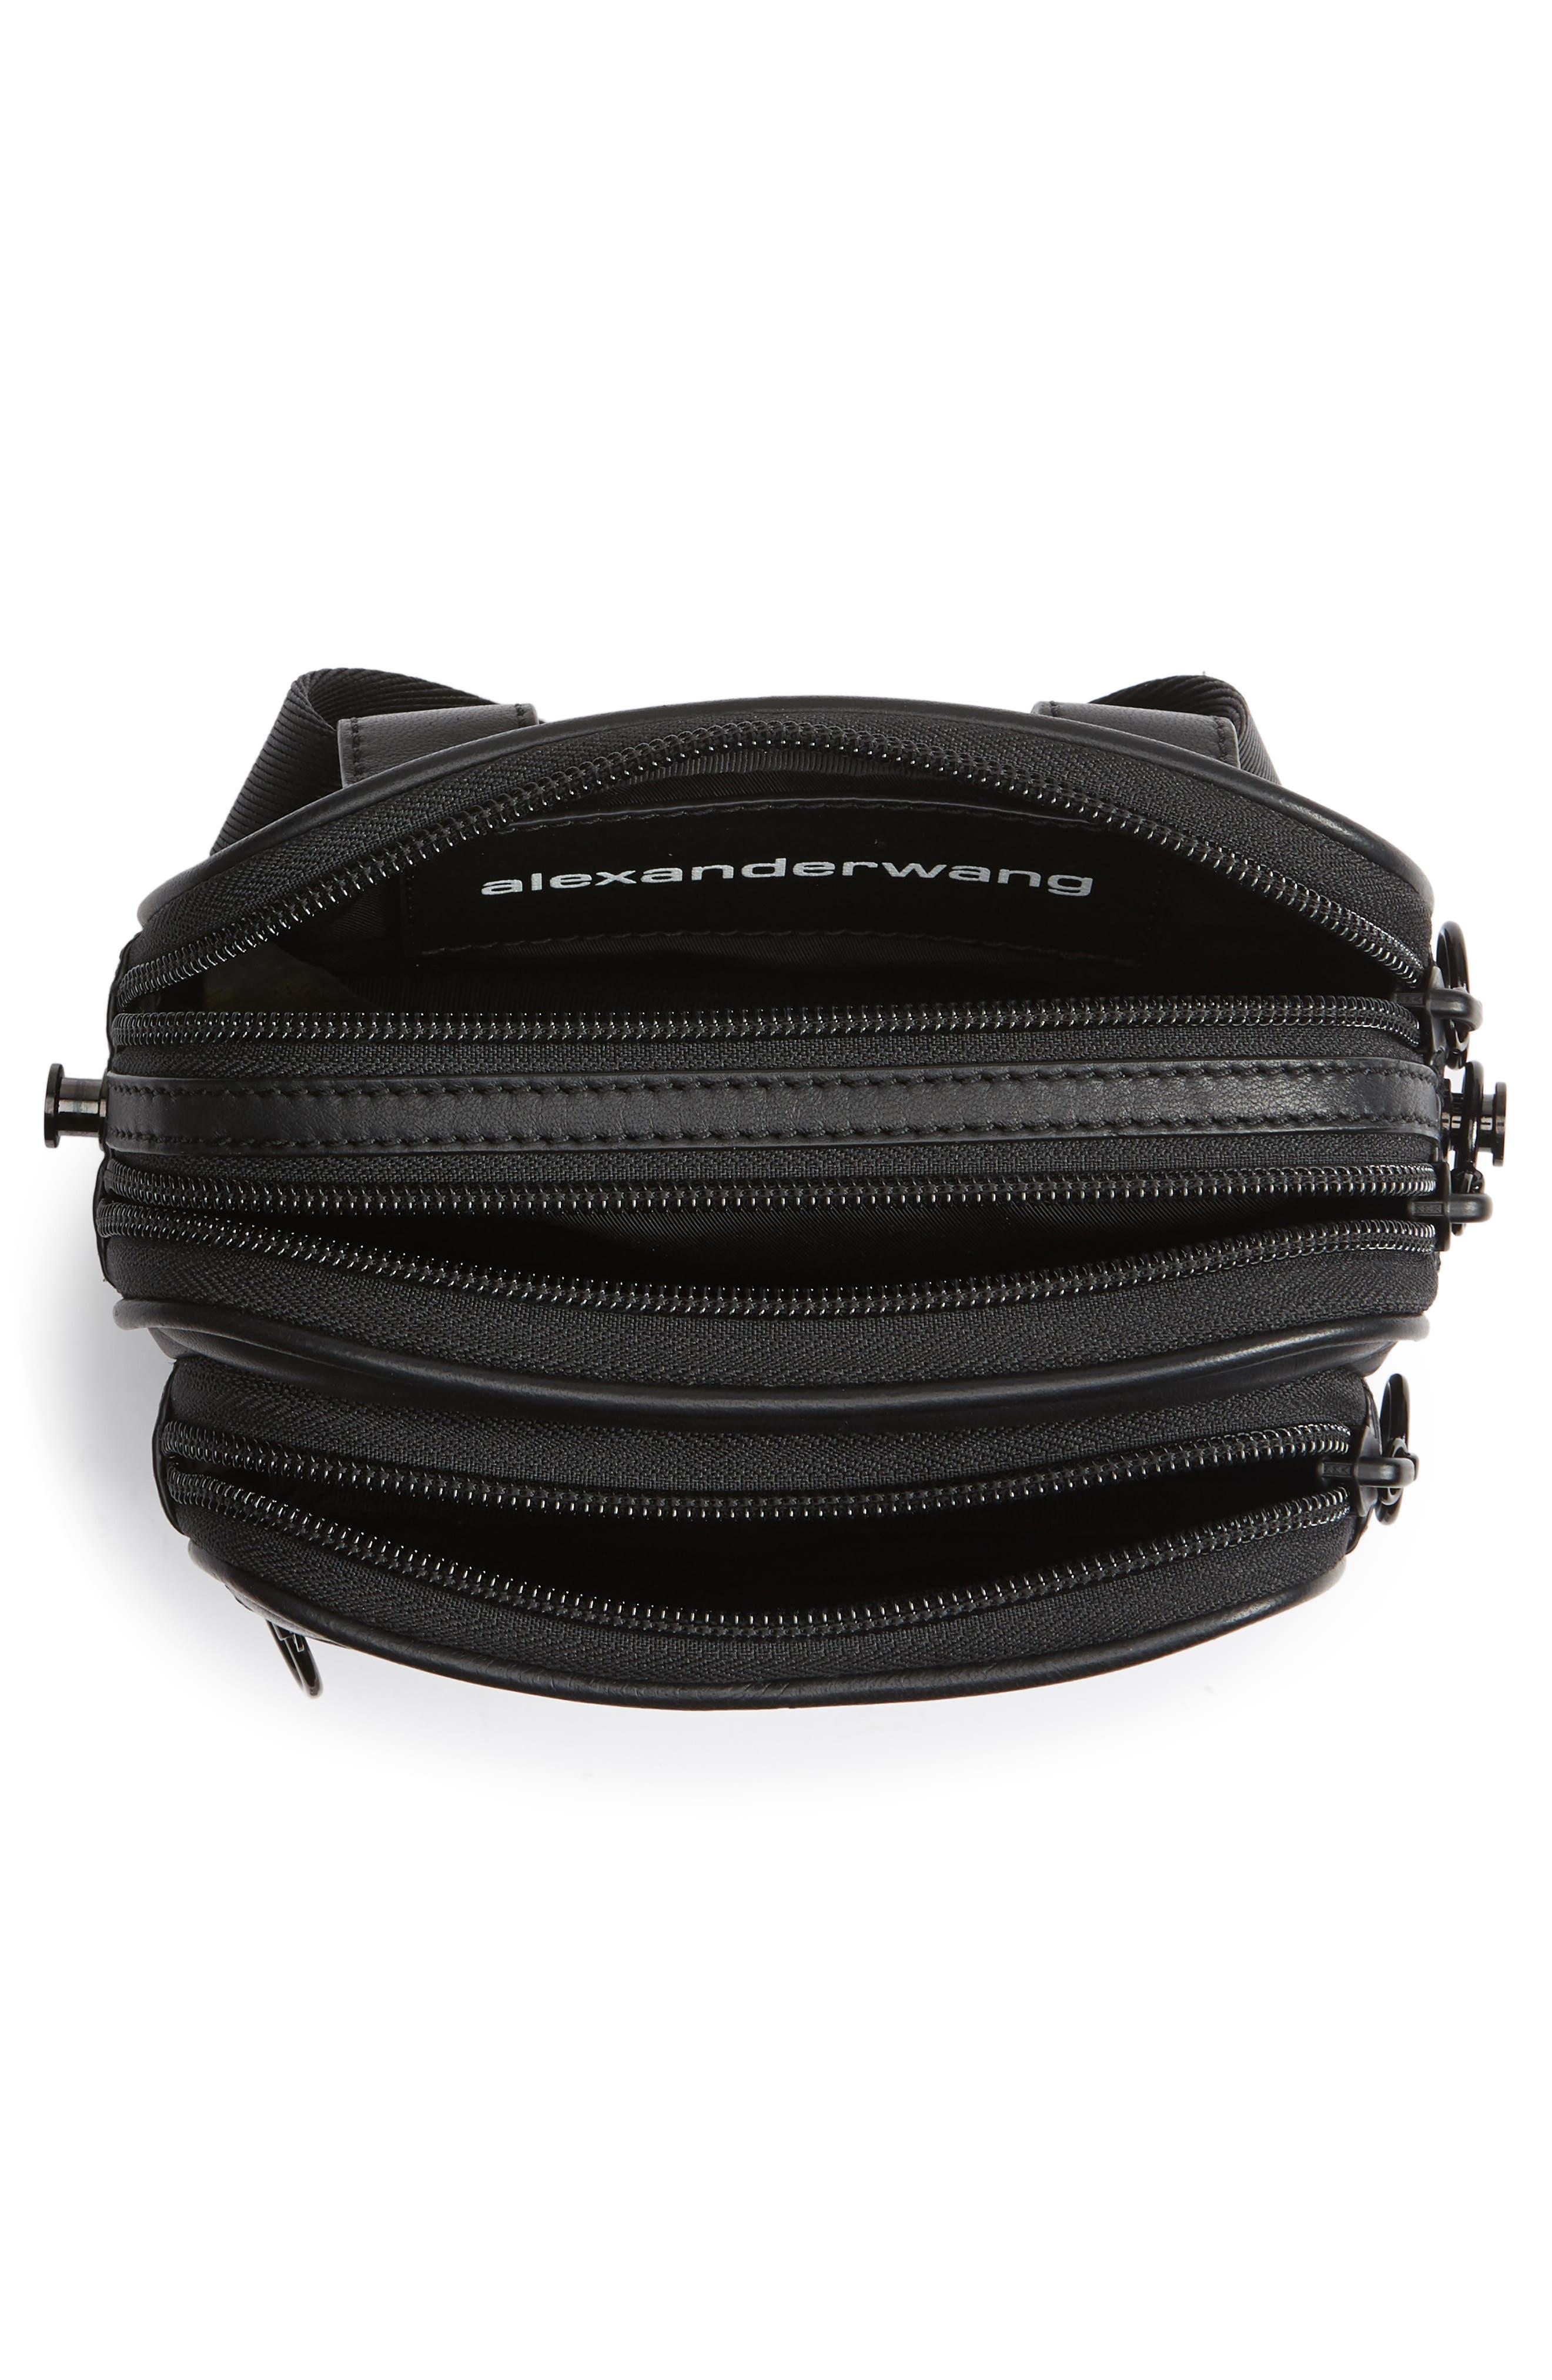 ALEXANDER WANG, Attica Logo Leather Belt Bag, Alternate thumbnail 6, color, BLACK